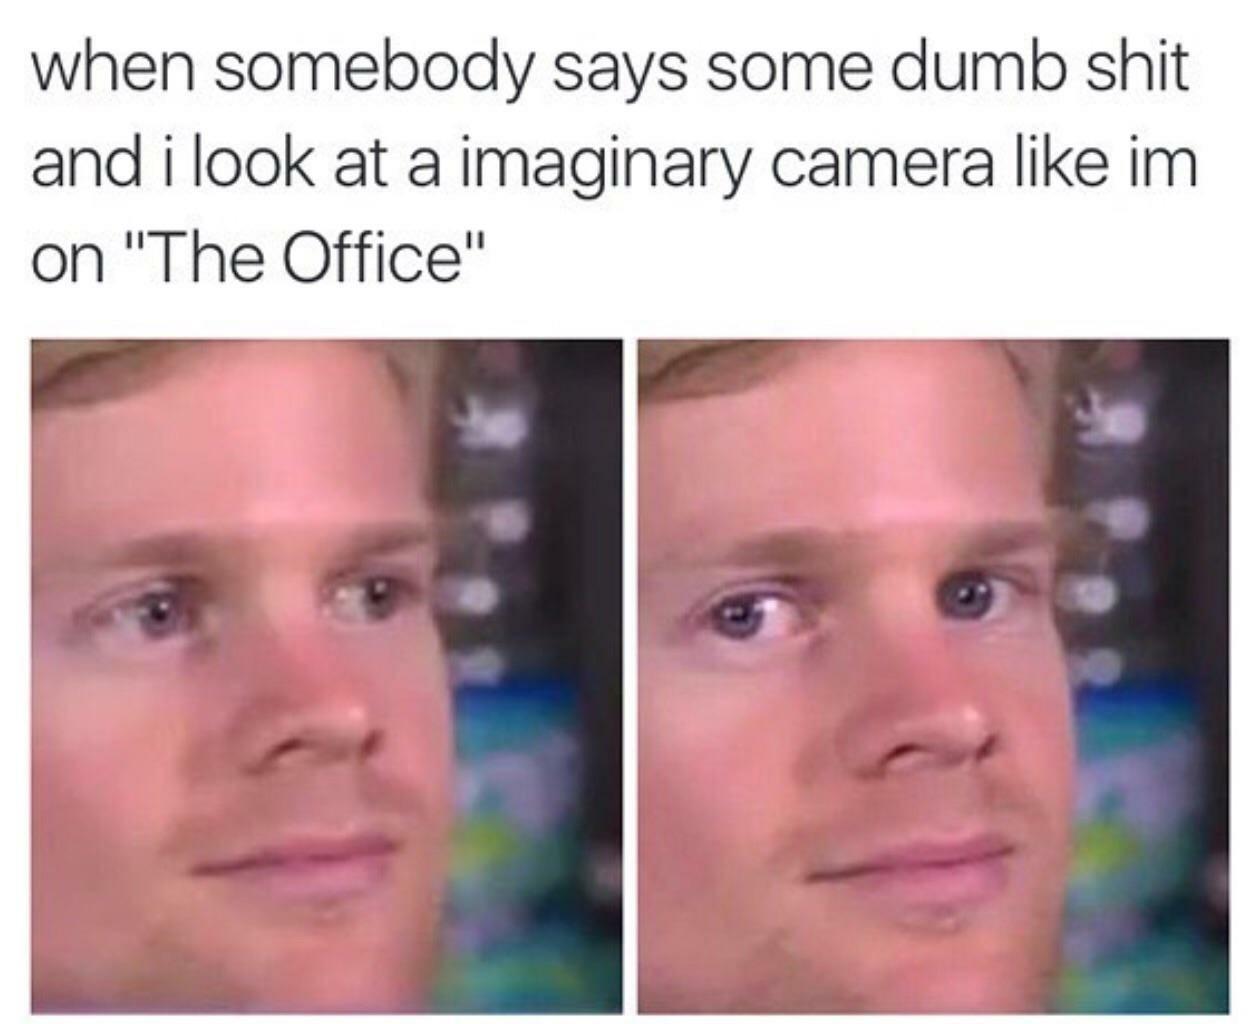 Imagine - meme